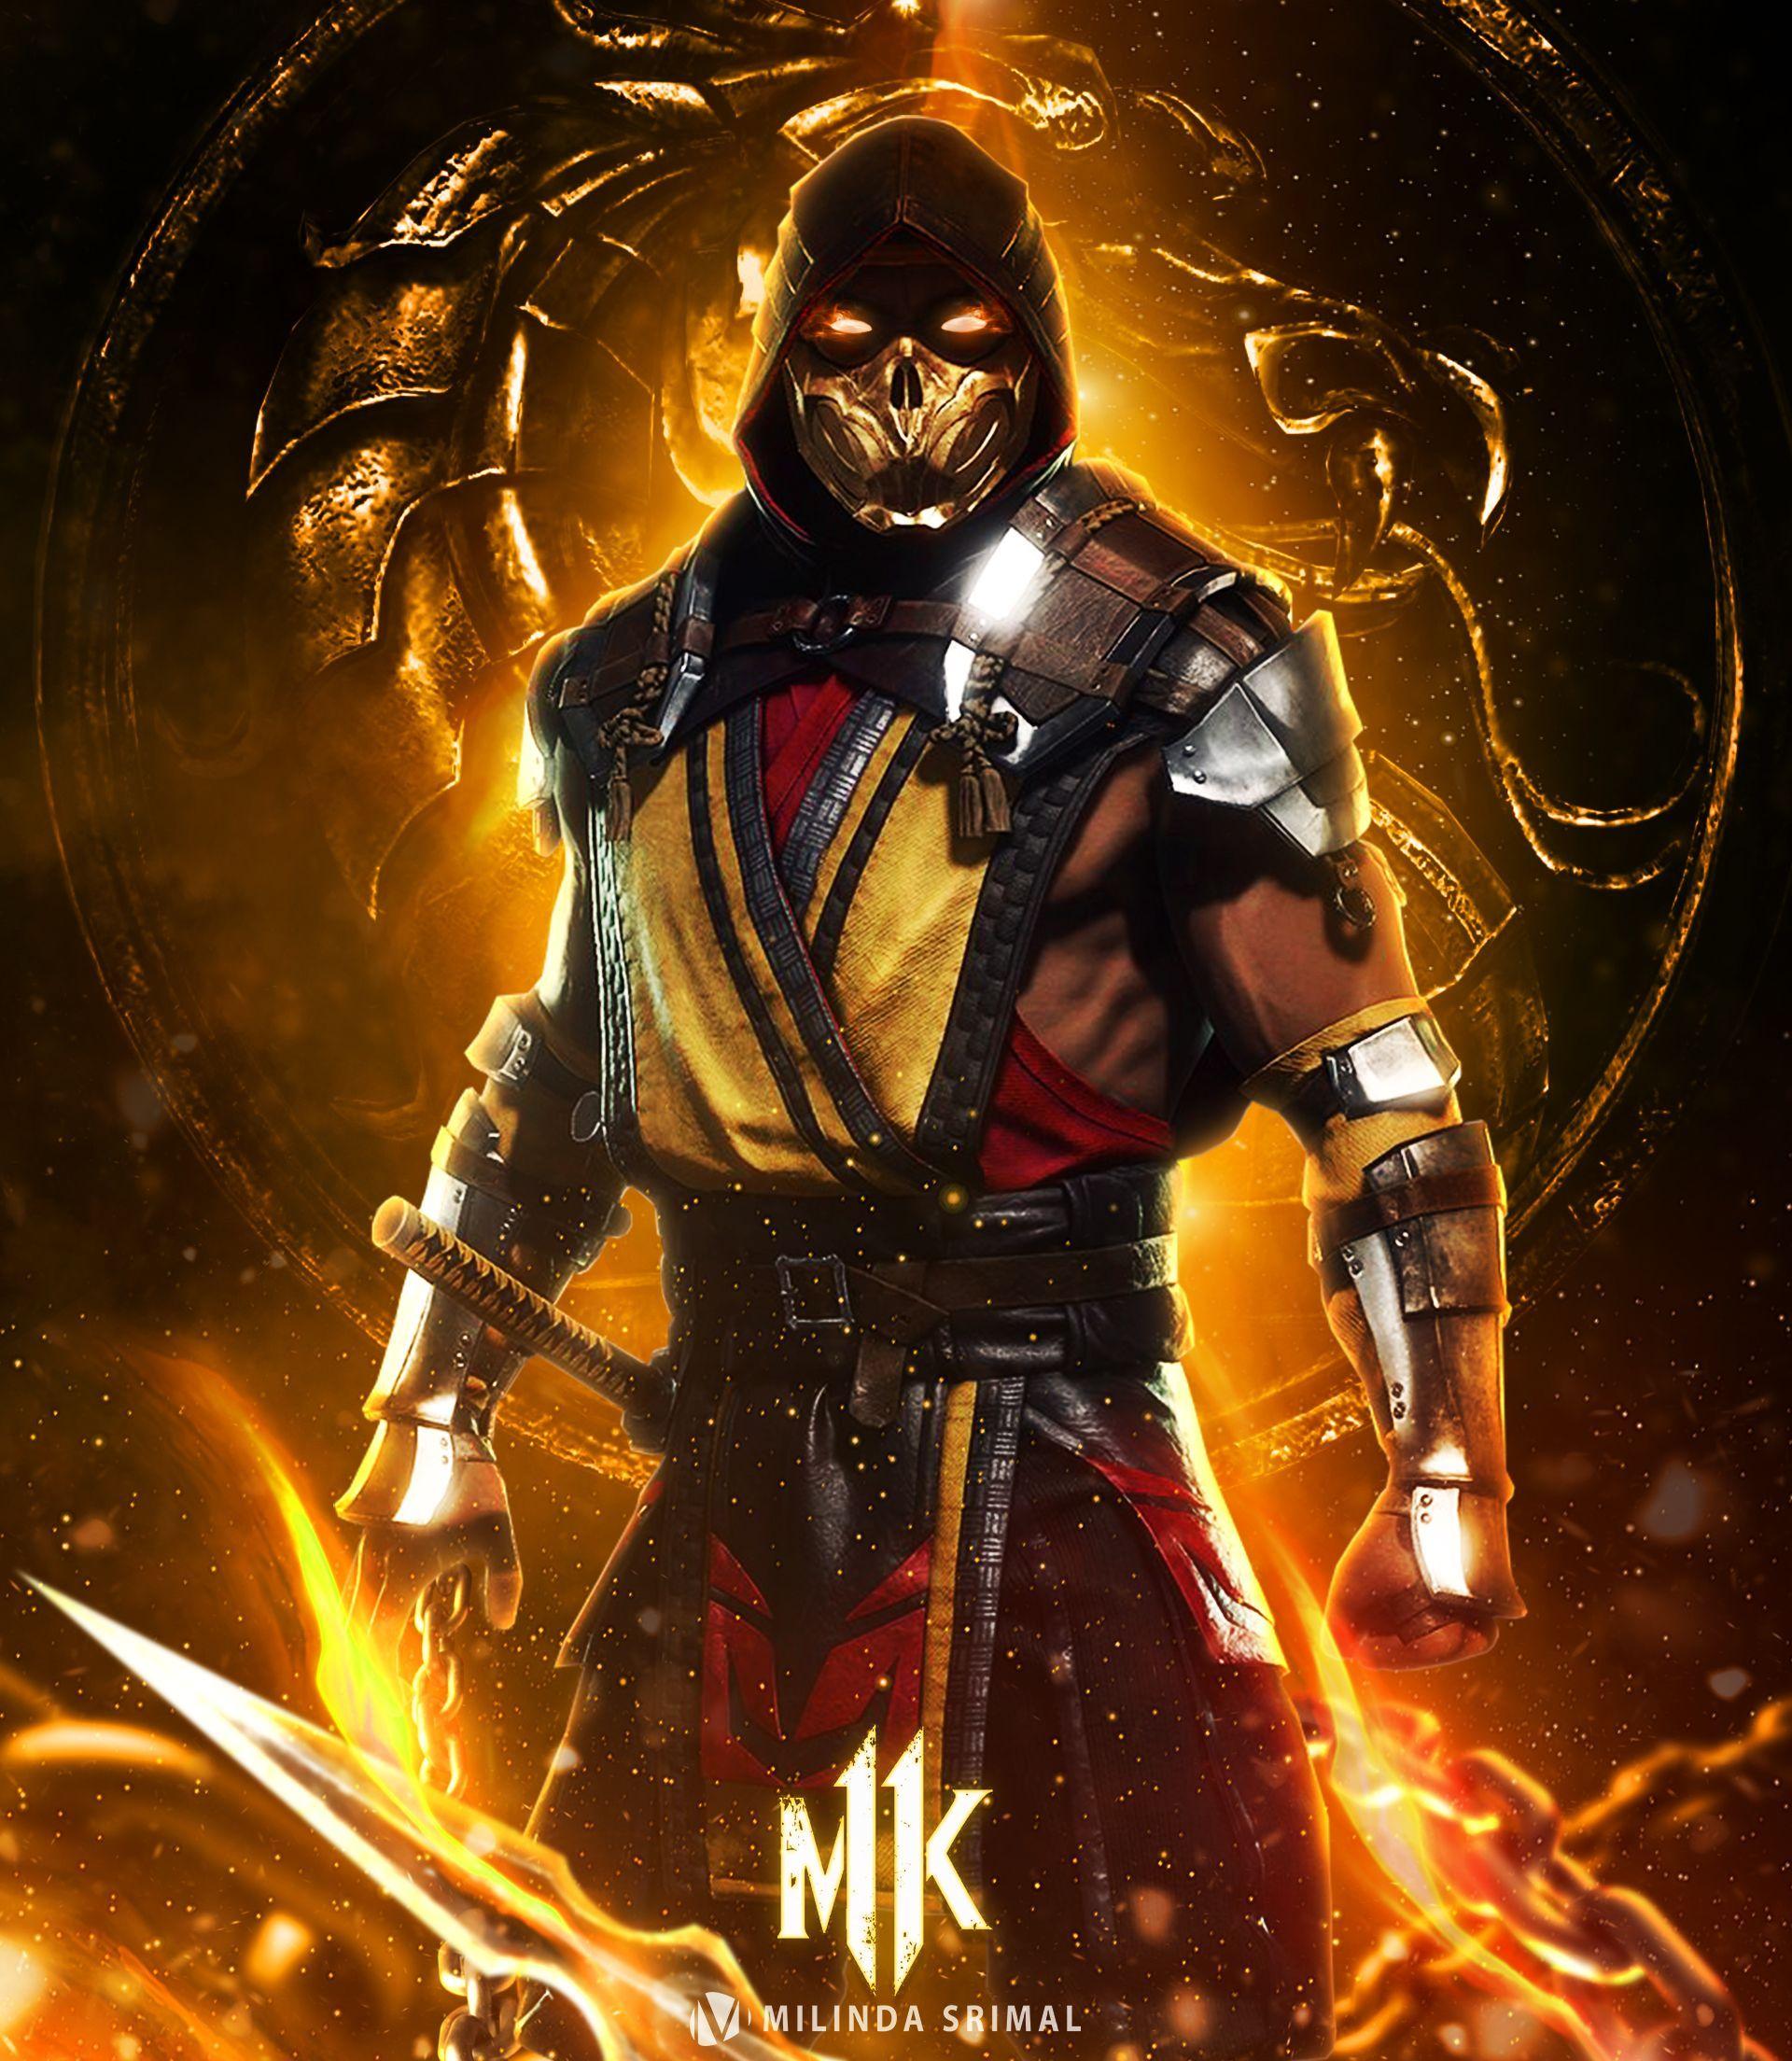 Mortal Kombat 2021 Wallpapers - Wallpaper Cave